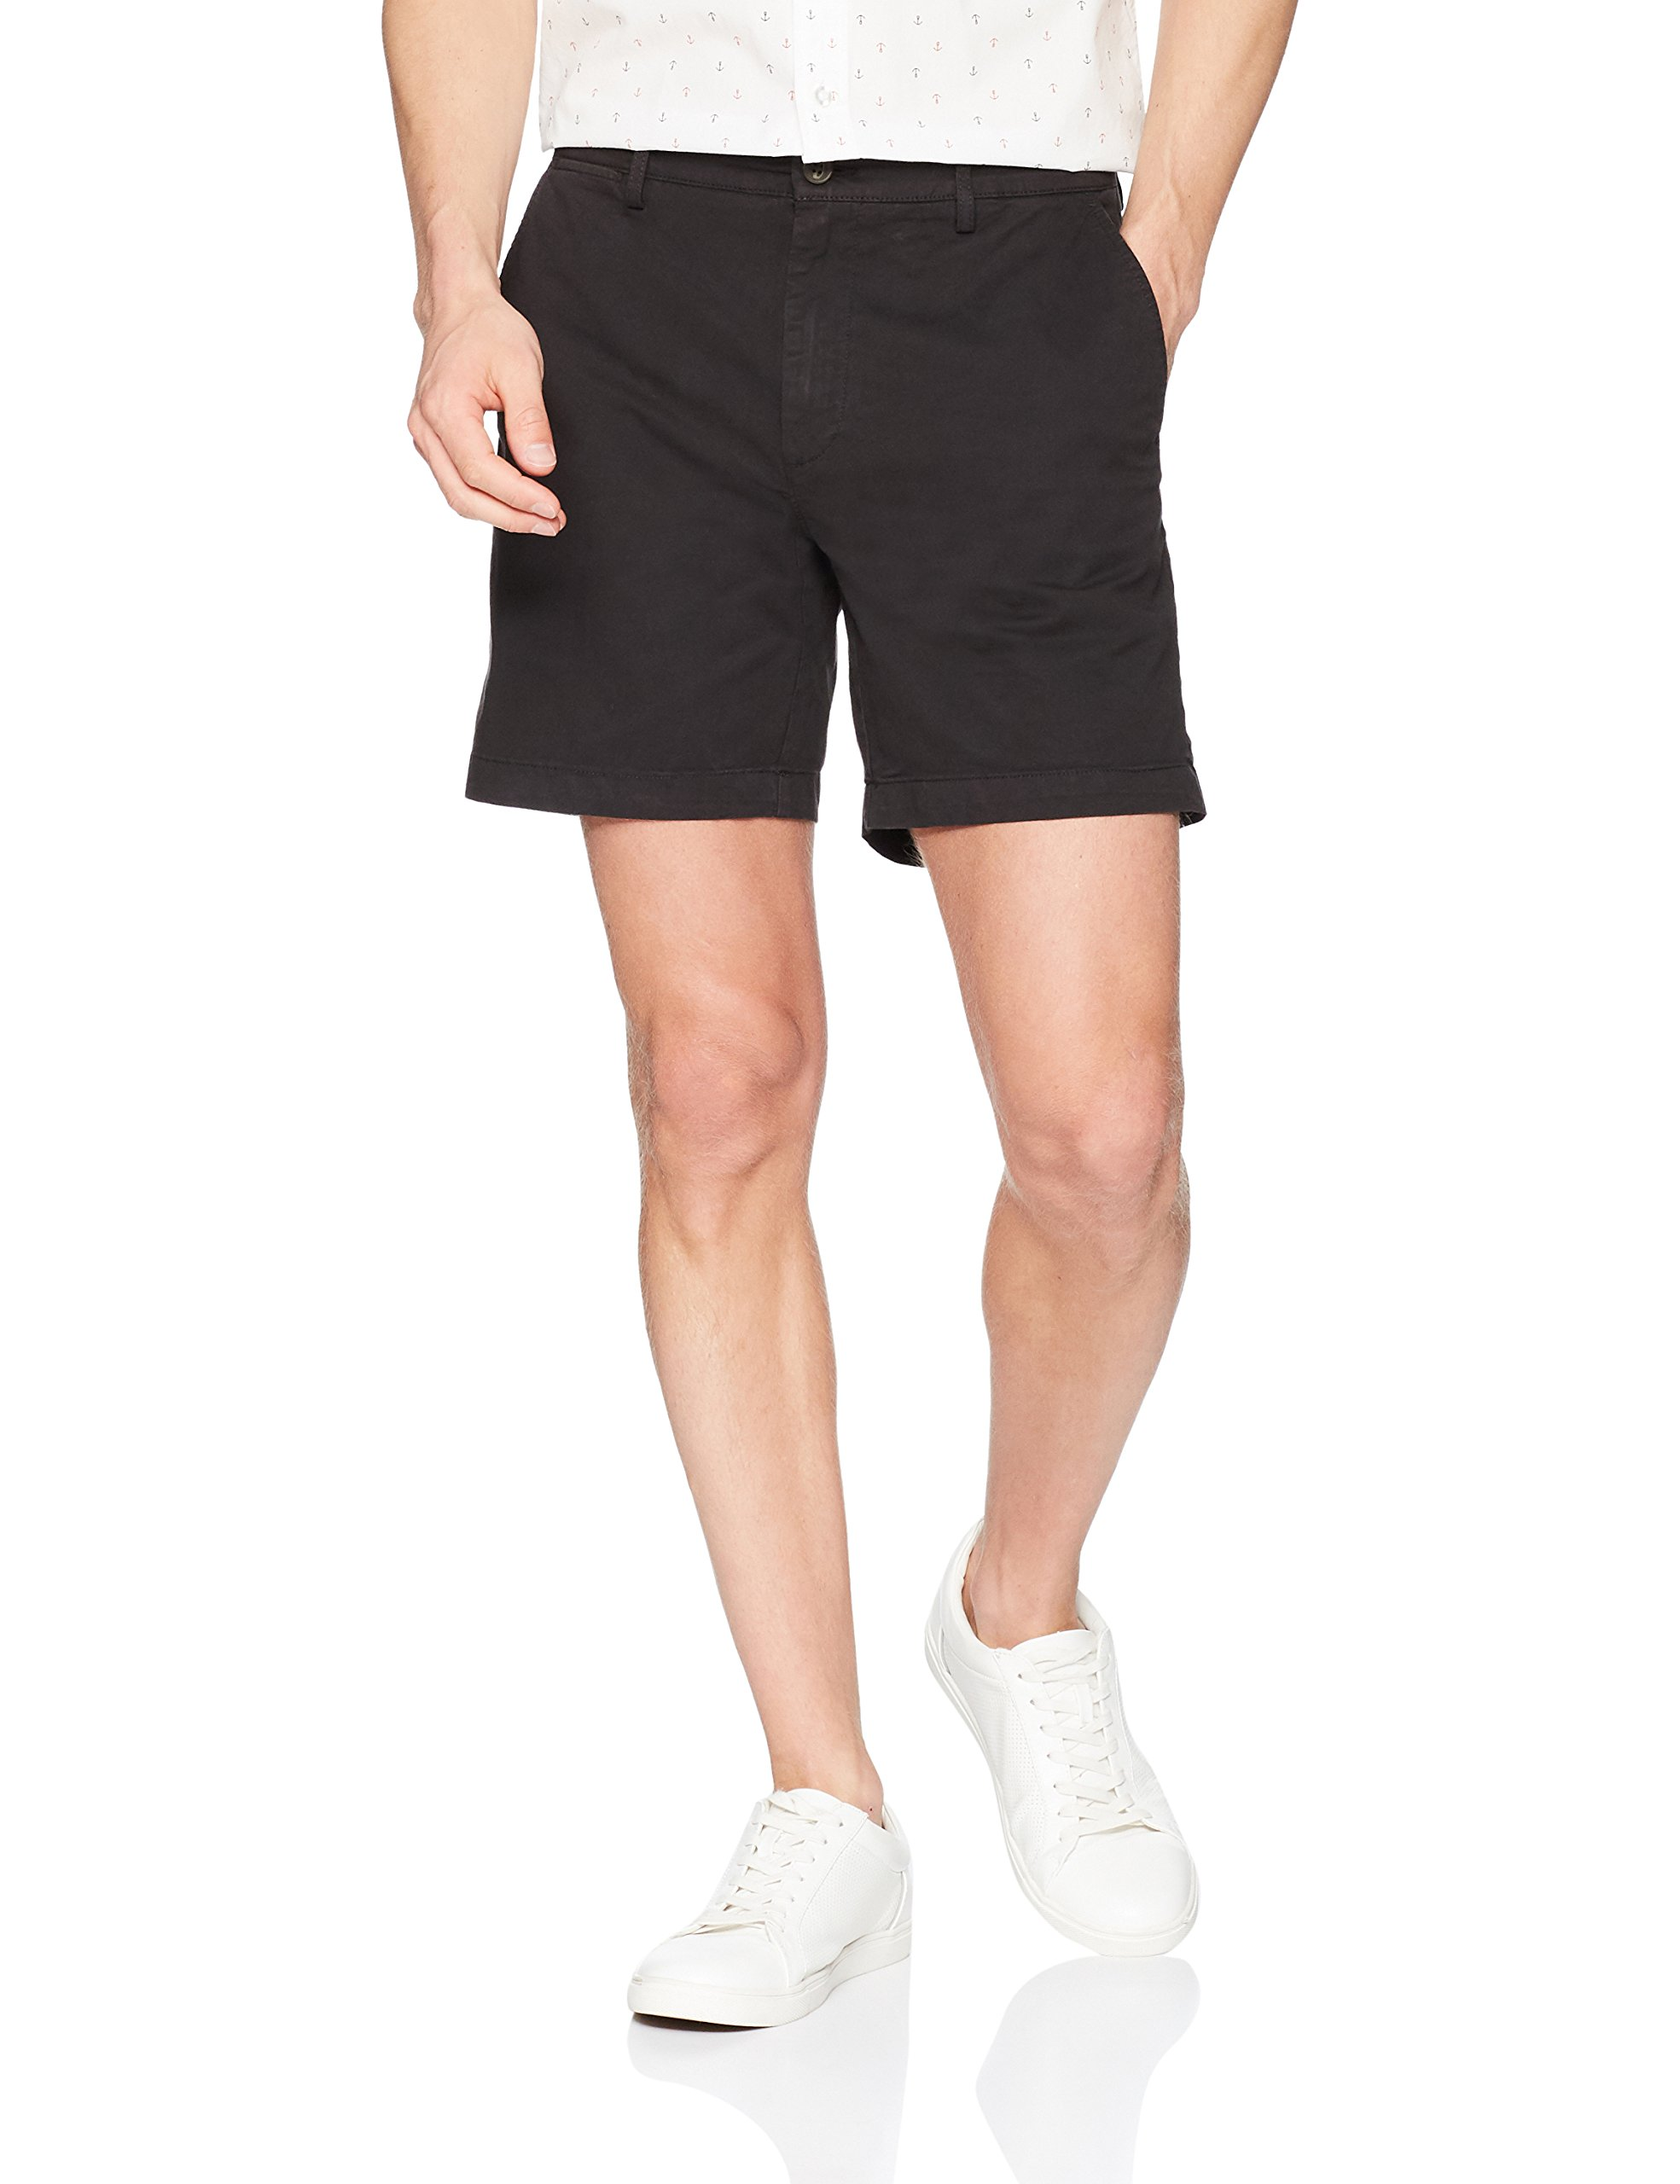 Goodthreads Men's 7'' Inseam Flat-Front Stretch Chino Short, Black, 34